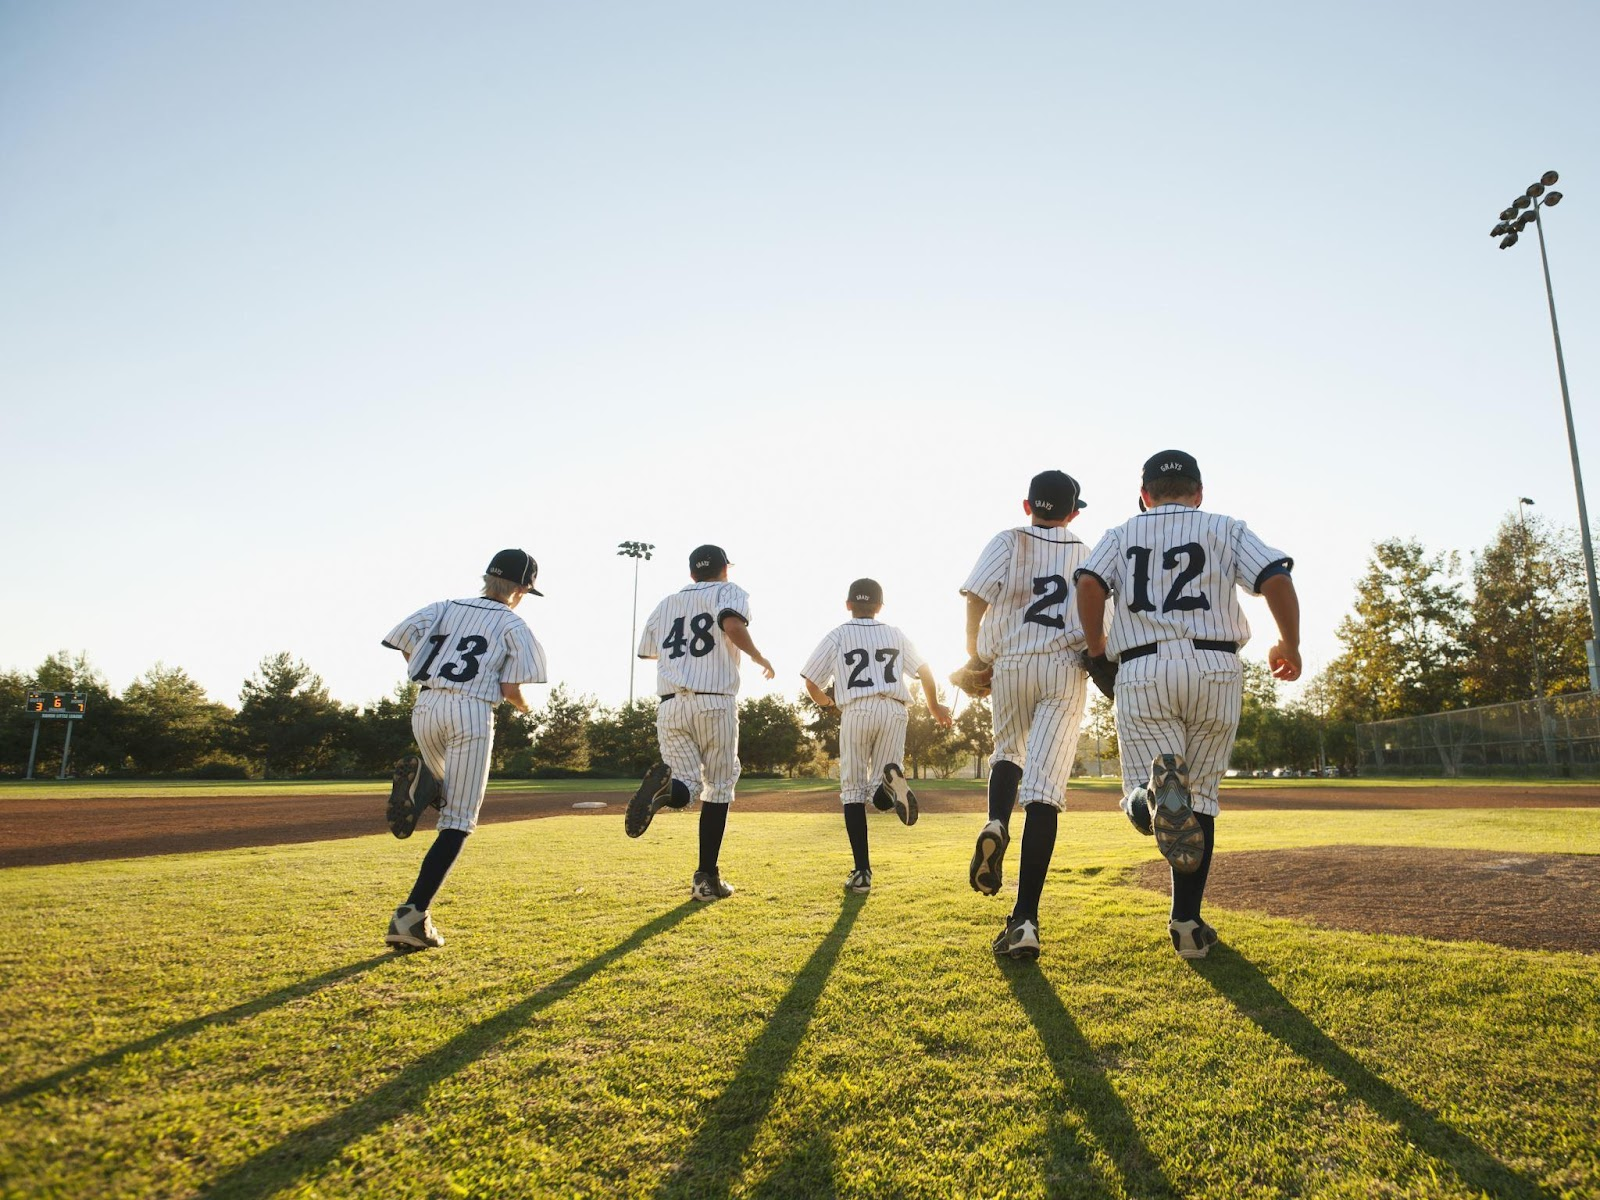 Baseball players running on field